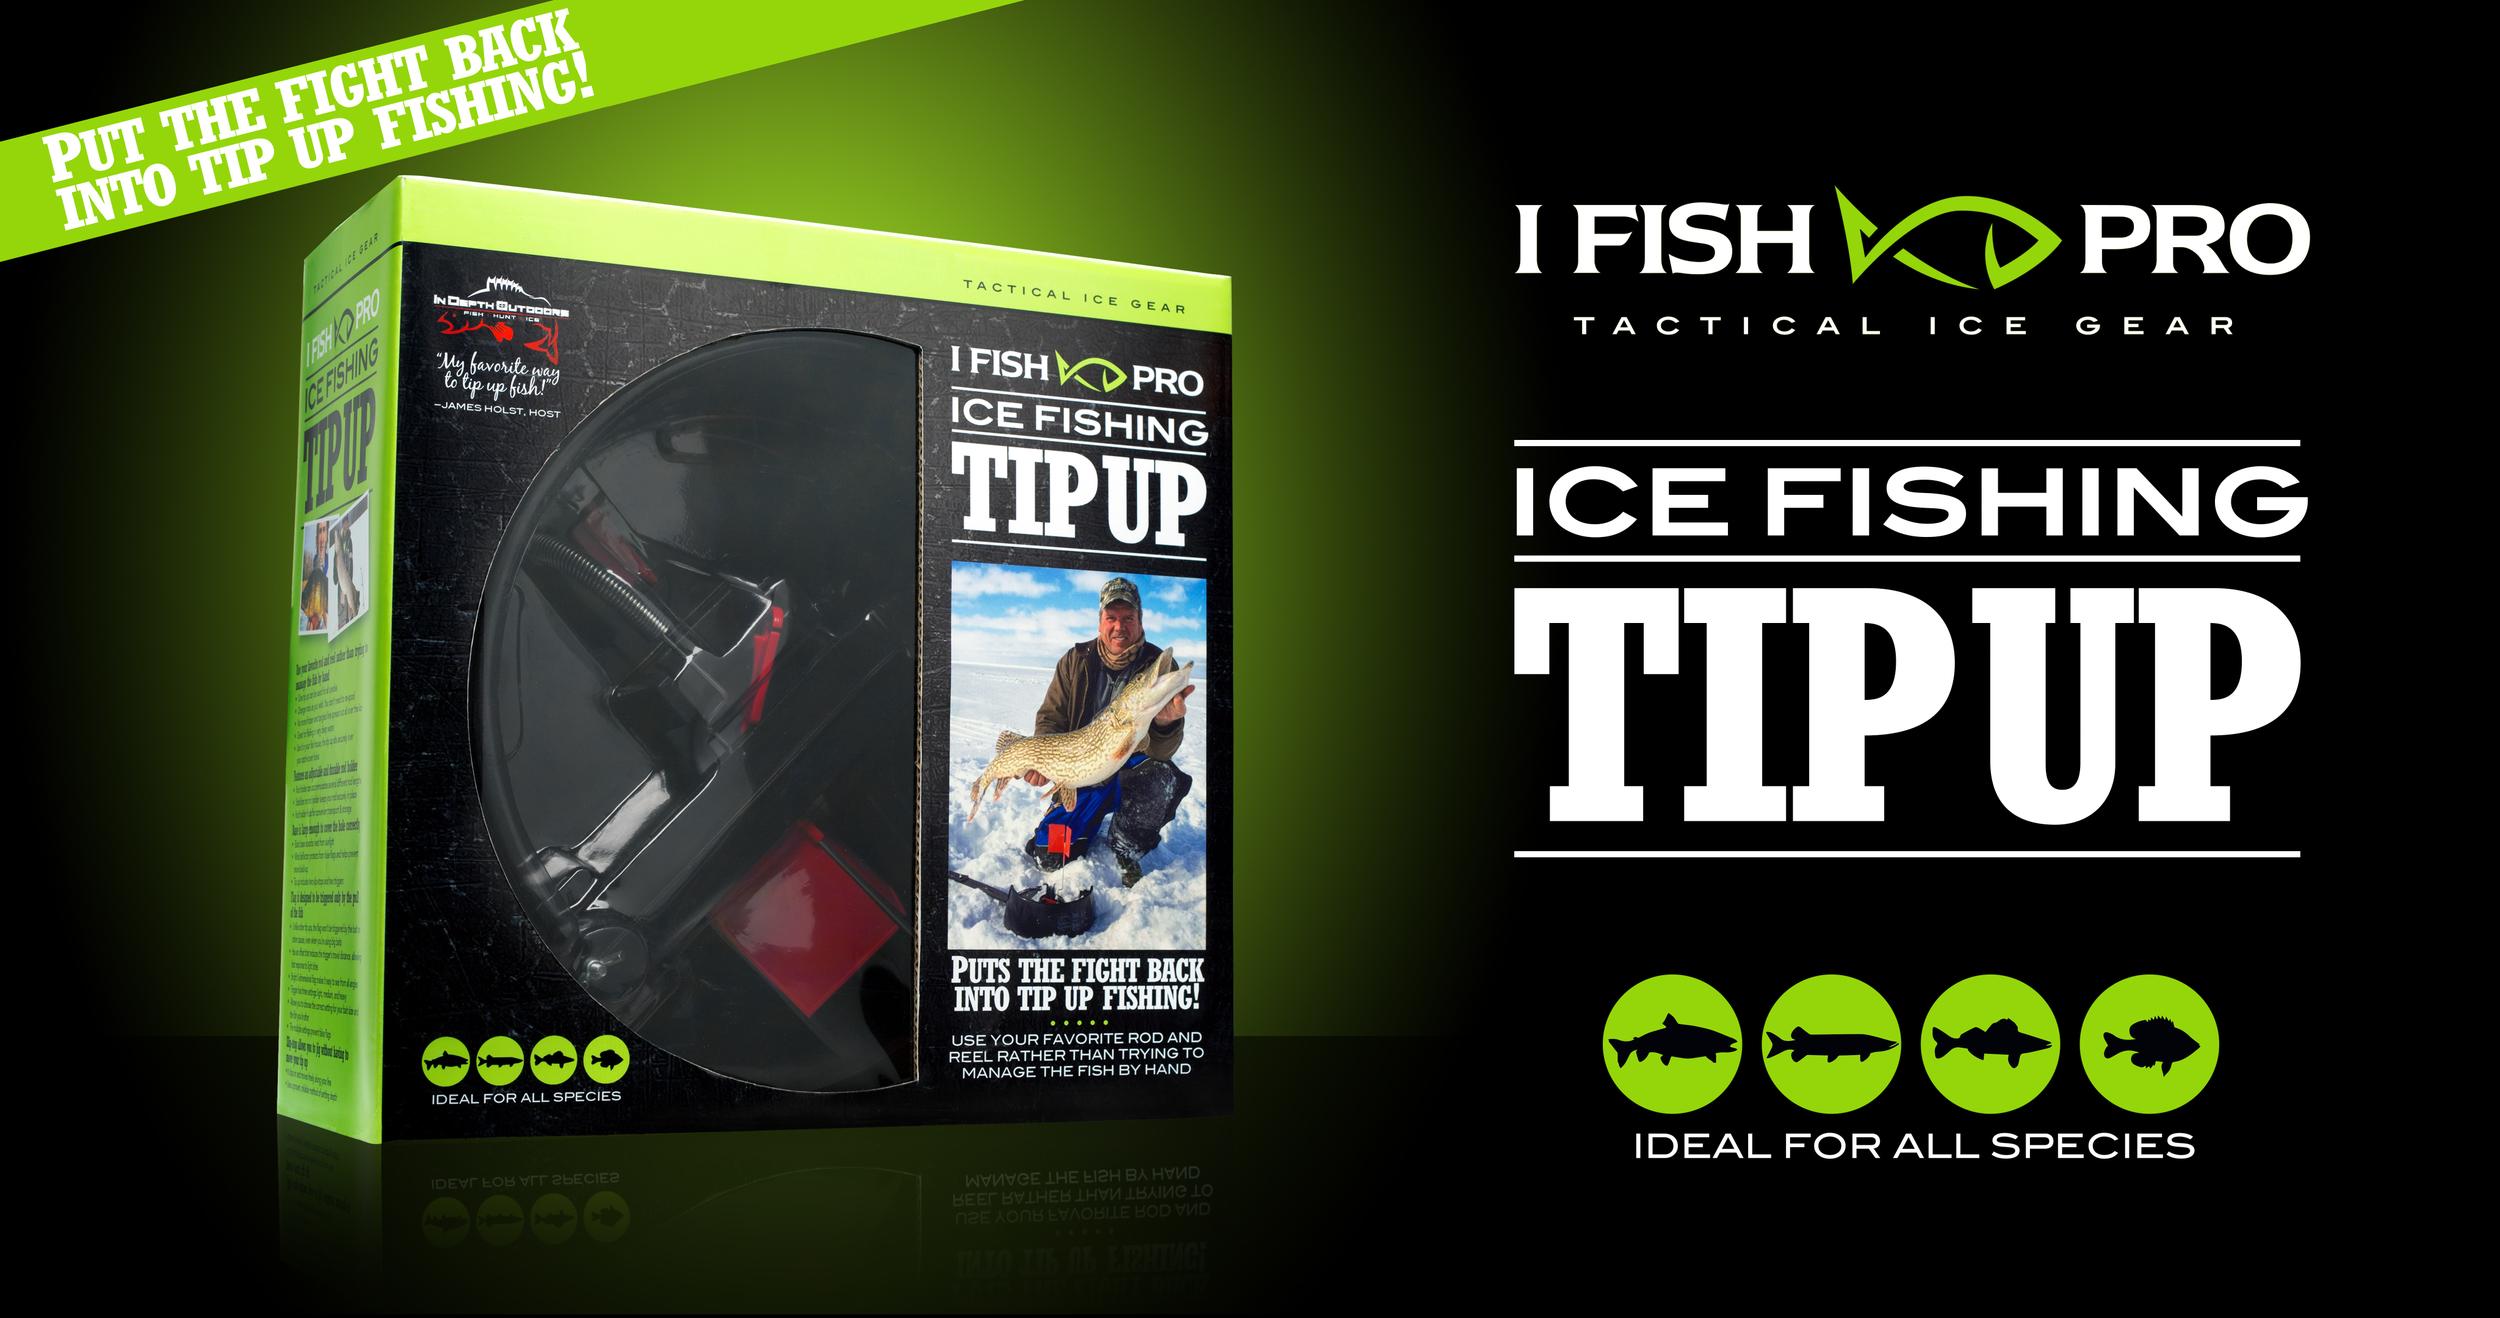 i fish pro retail